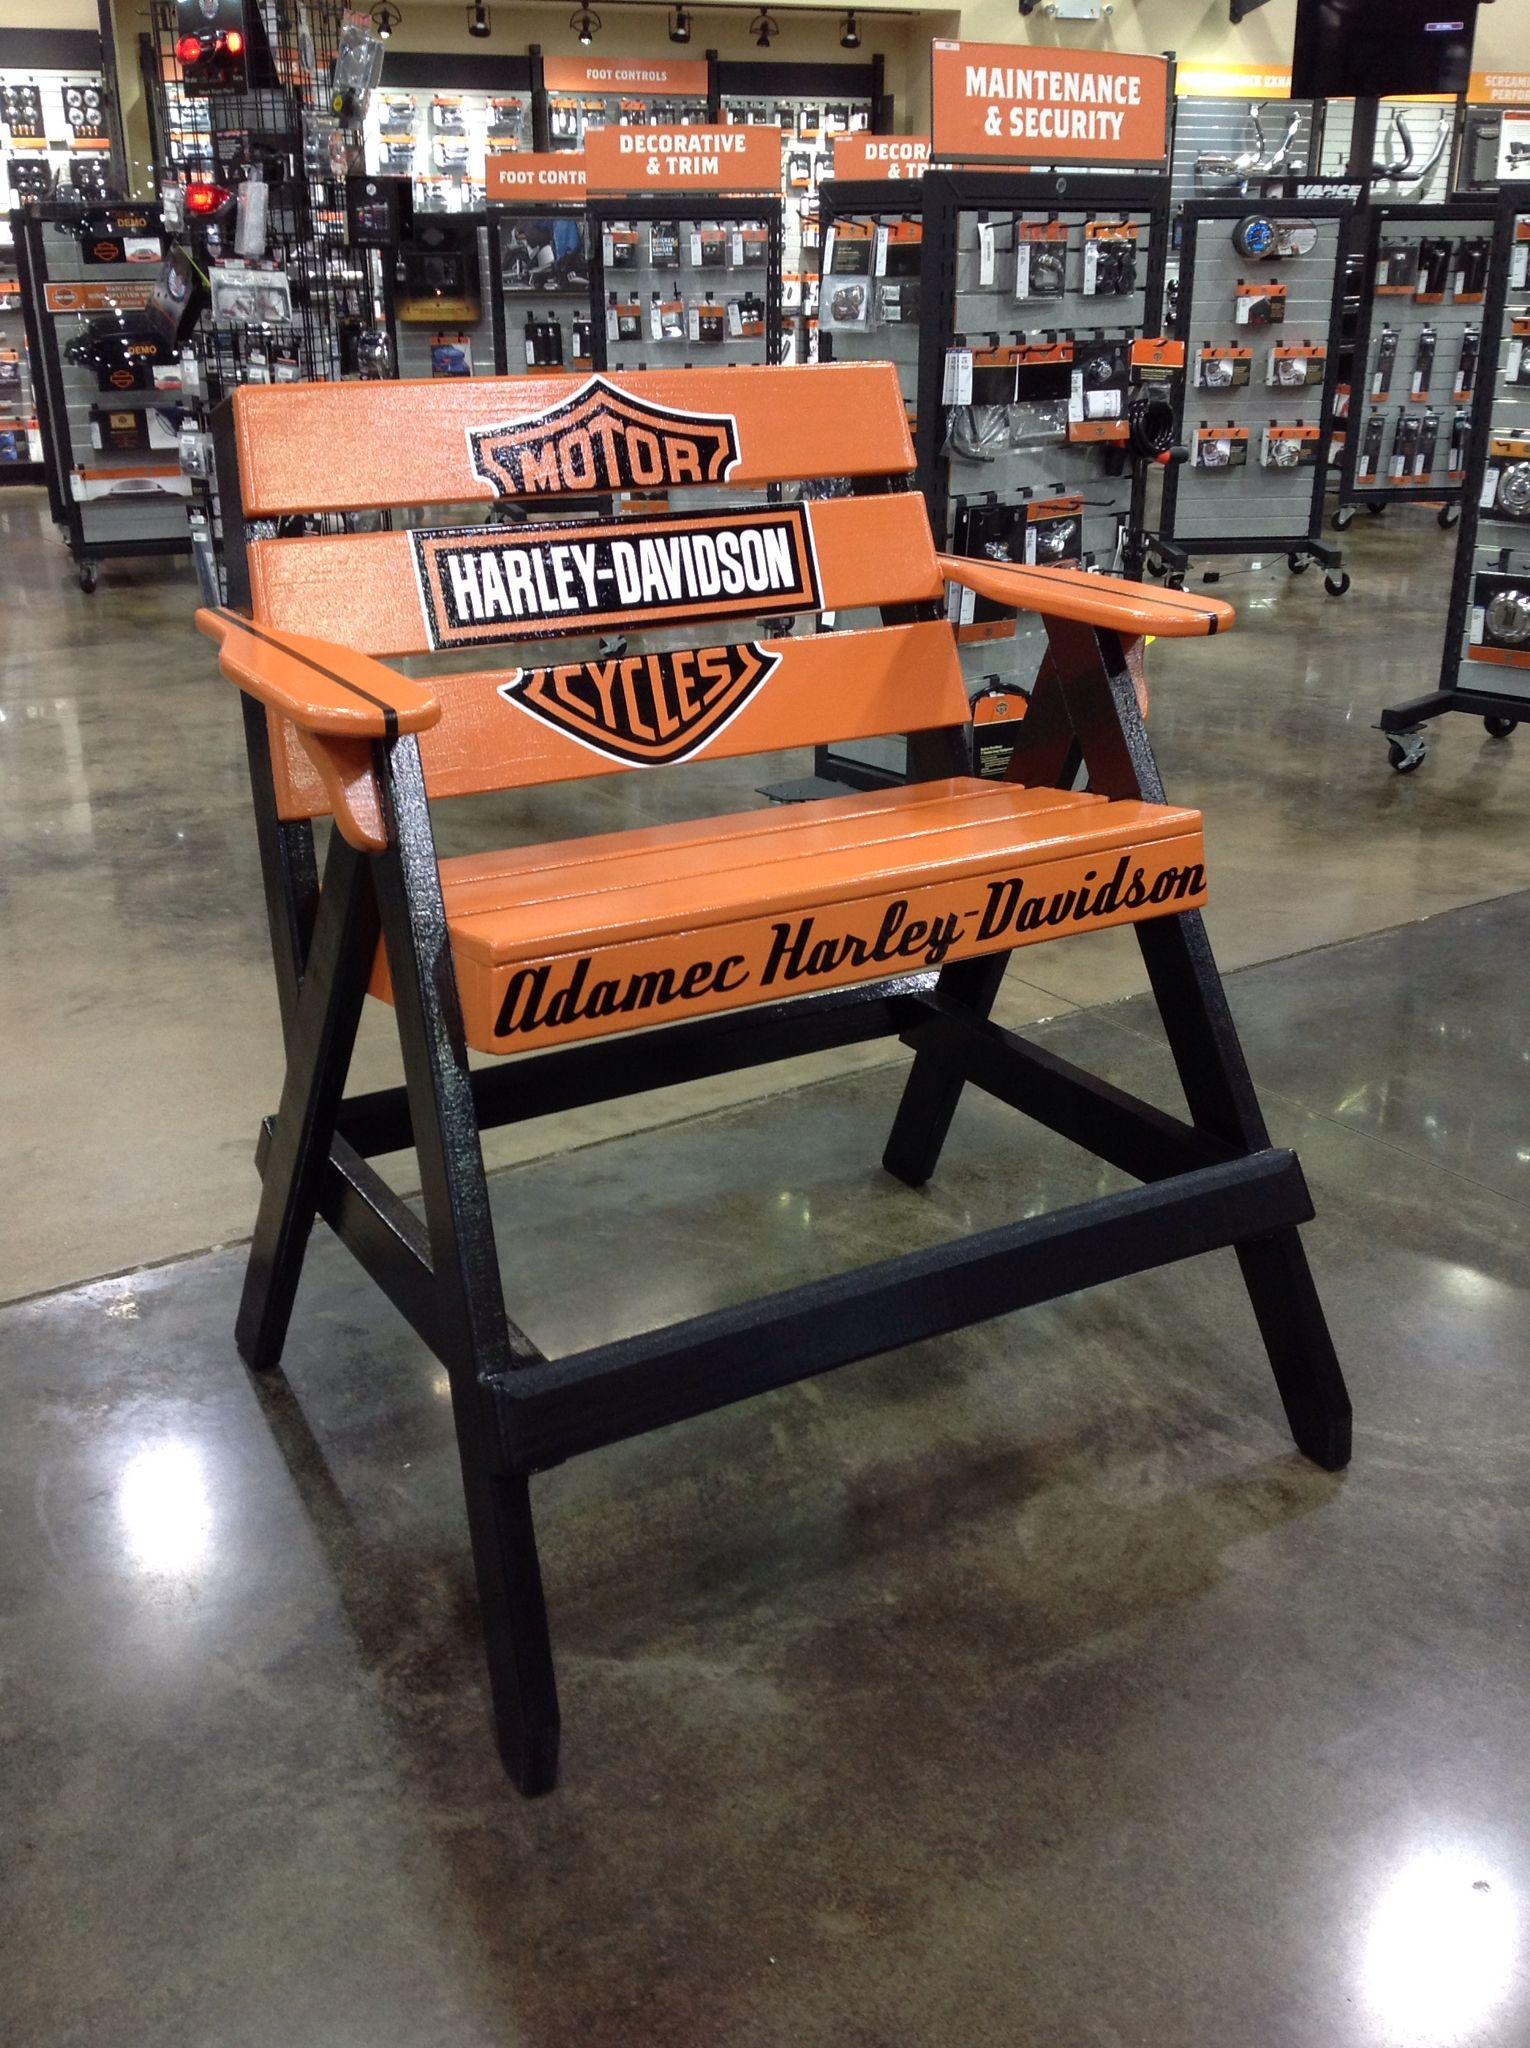 Custom Built Adamec Harley Davidson Liuard Chair By Alan Dunavant Decor For Dunavantdecor Liuardchair